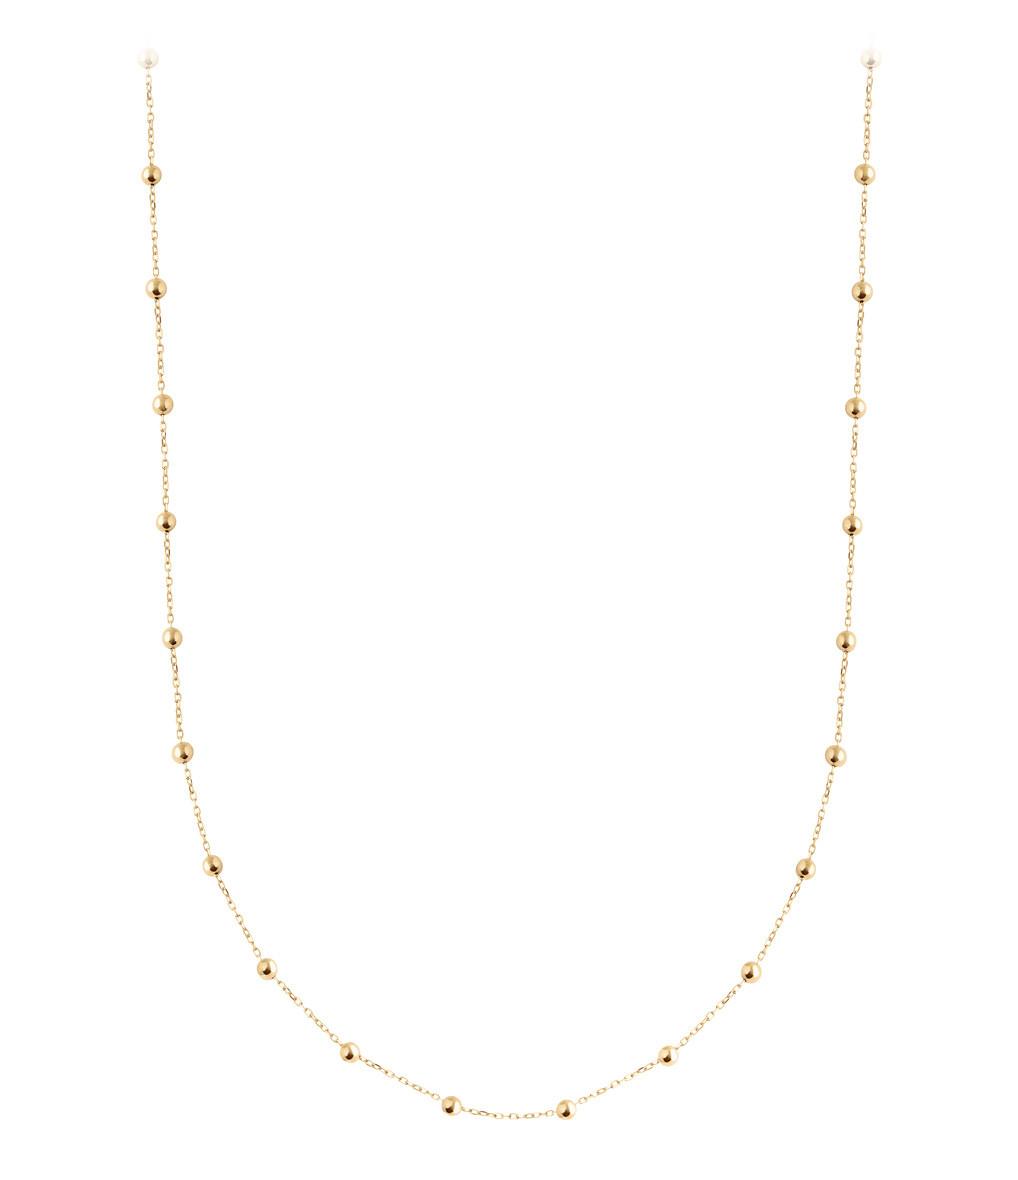 CHARLET - Chaine Boule 40 cm